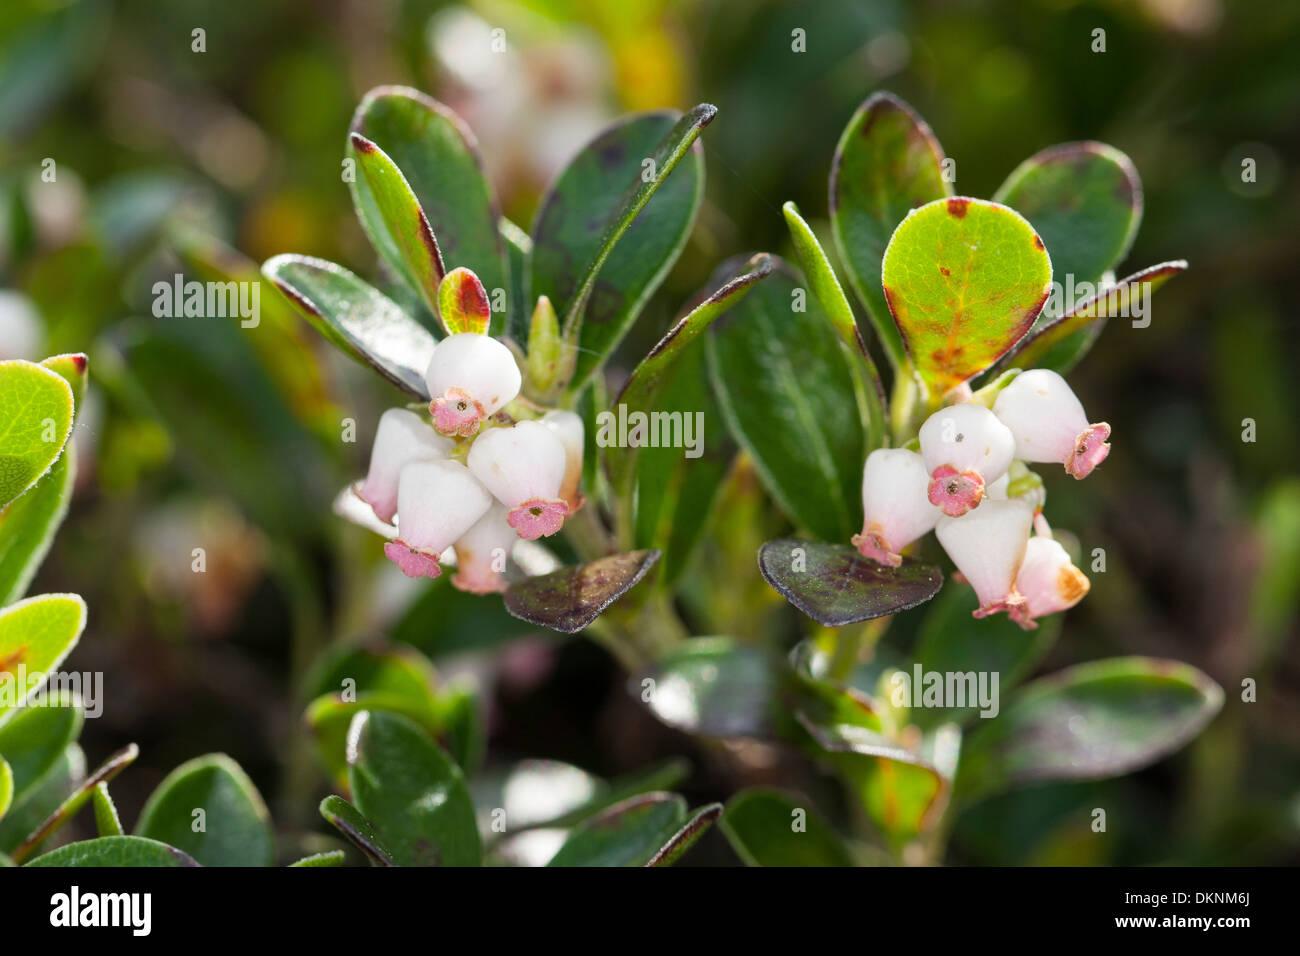 Bearberry, Mountain Cranberry, Echte Bärentraube, Immergrüne Bärentraube, Arctostaphylos uva-ursi, Busserolle, Raisin d´ours - Stock Image